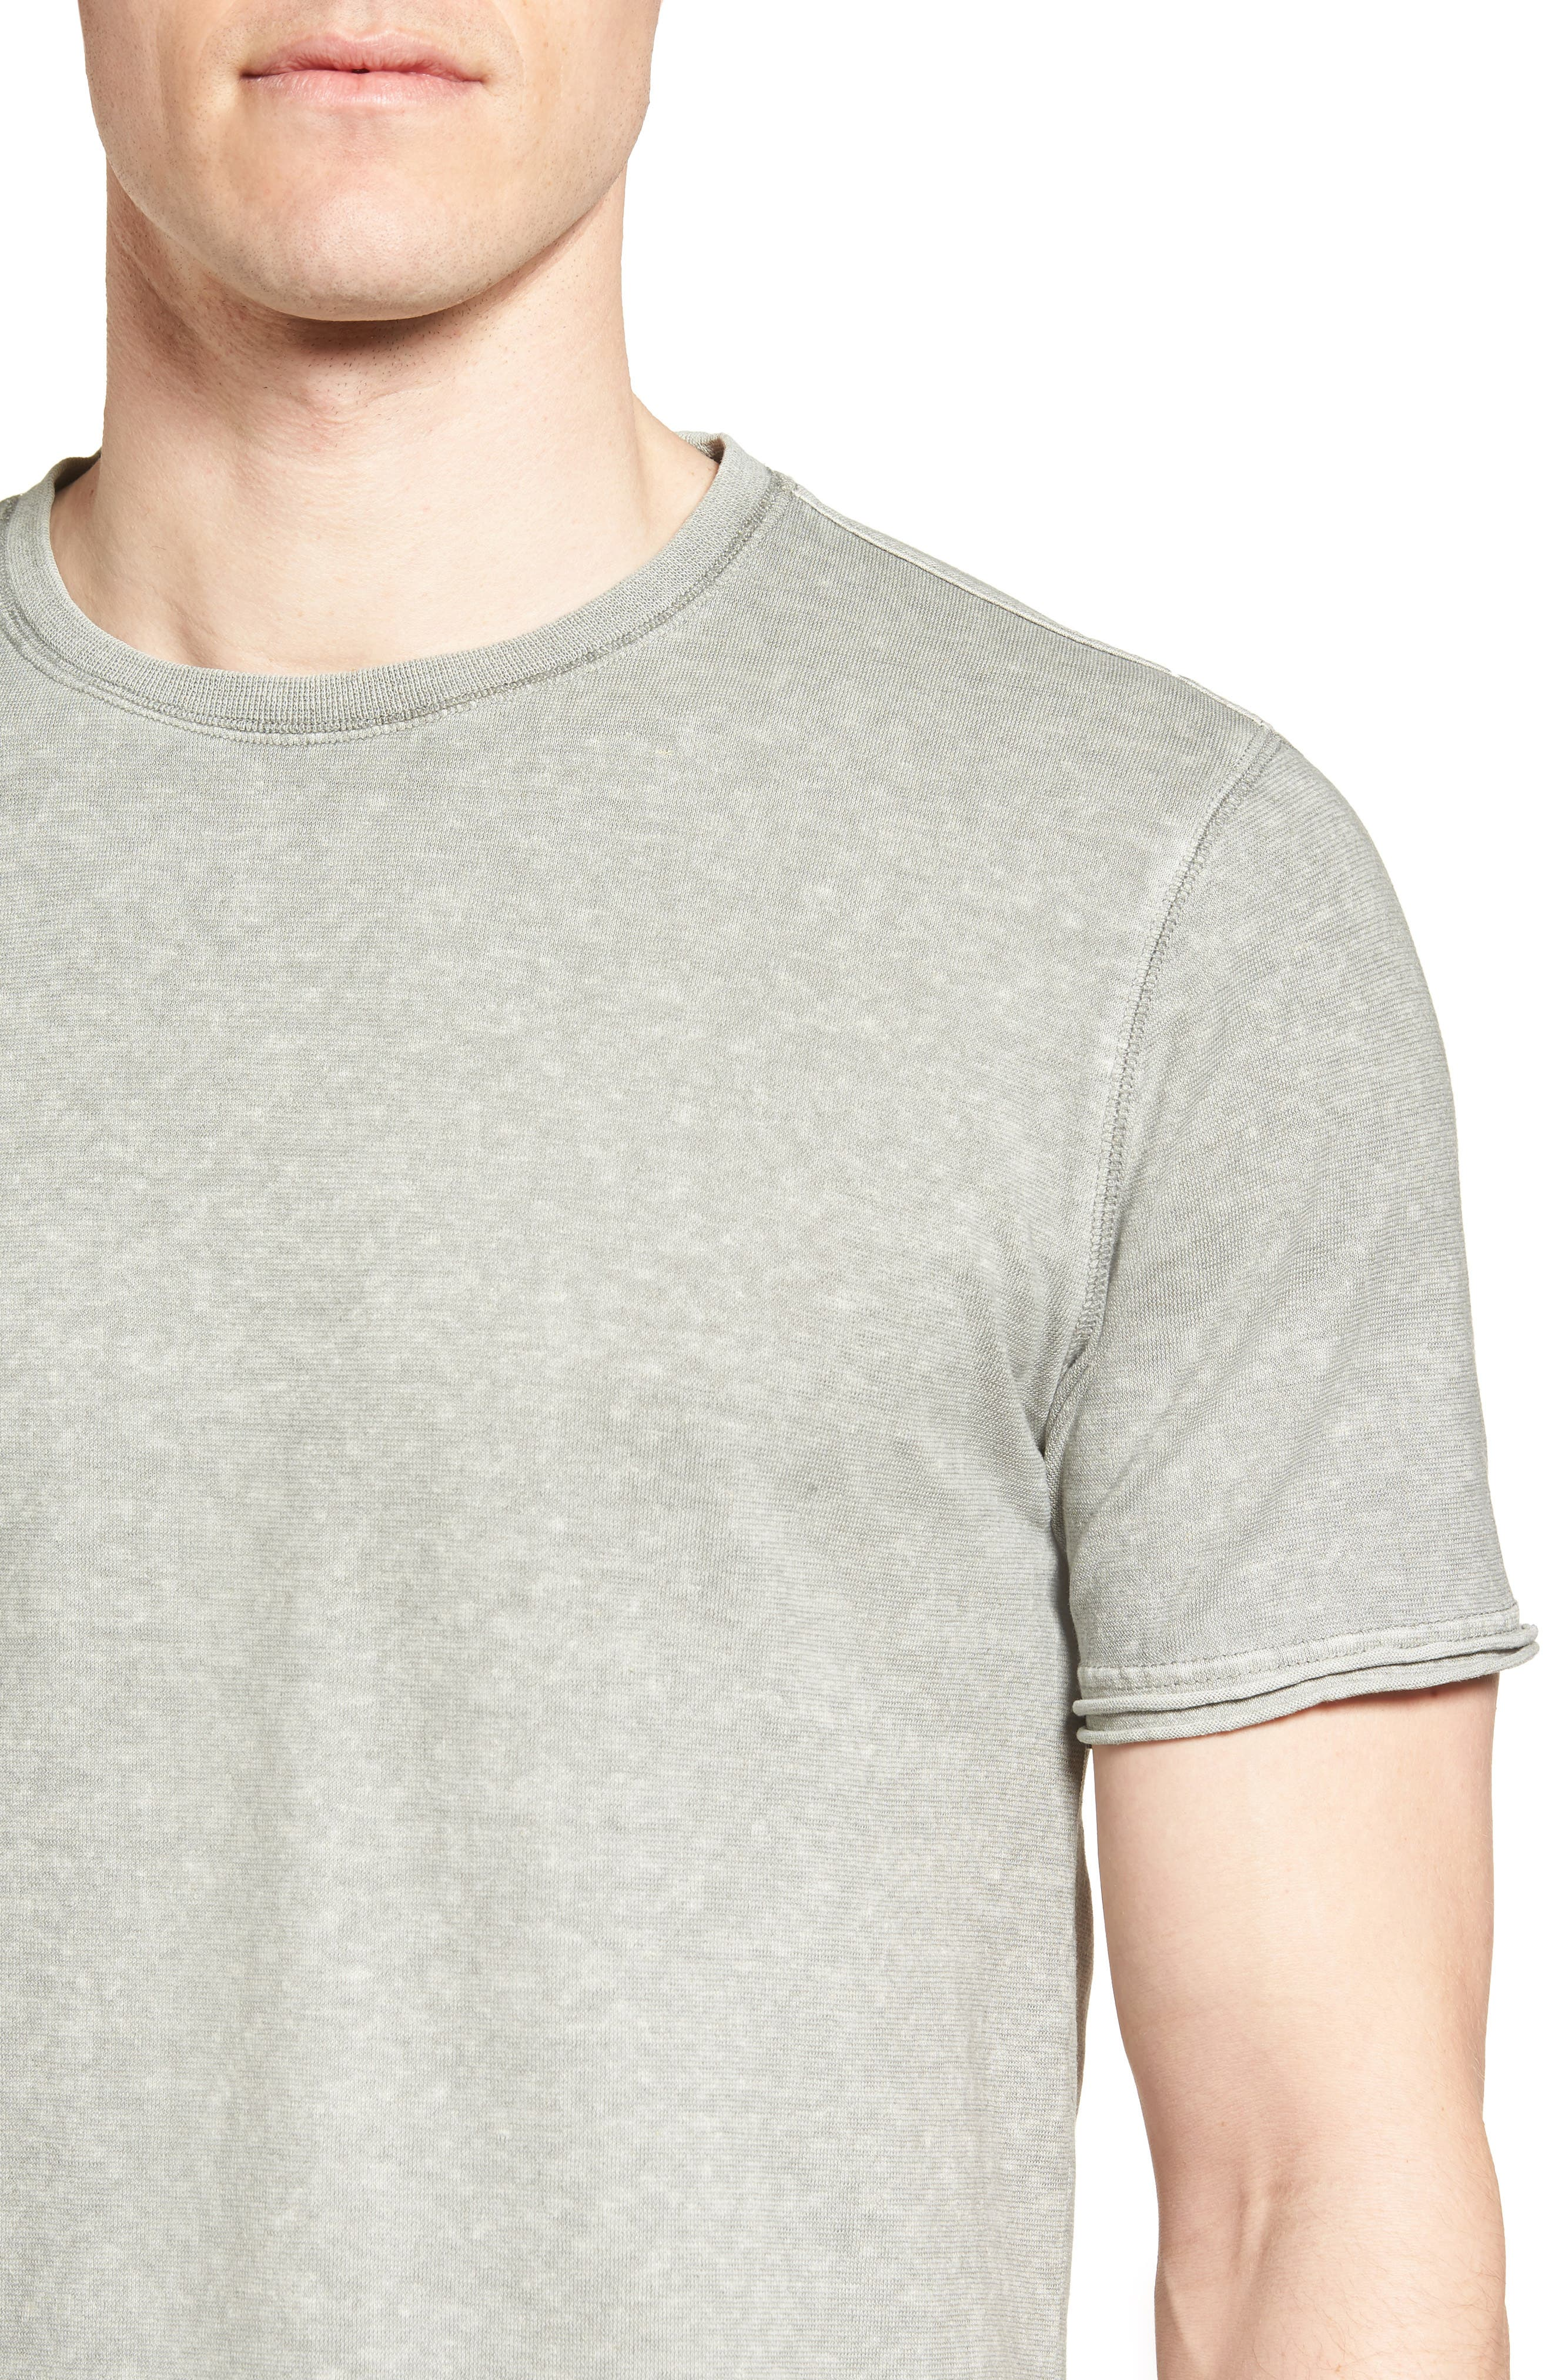 Camura T-Shirt,                             Alternate thumbnail 4, color,                             021